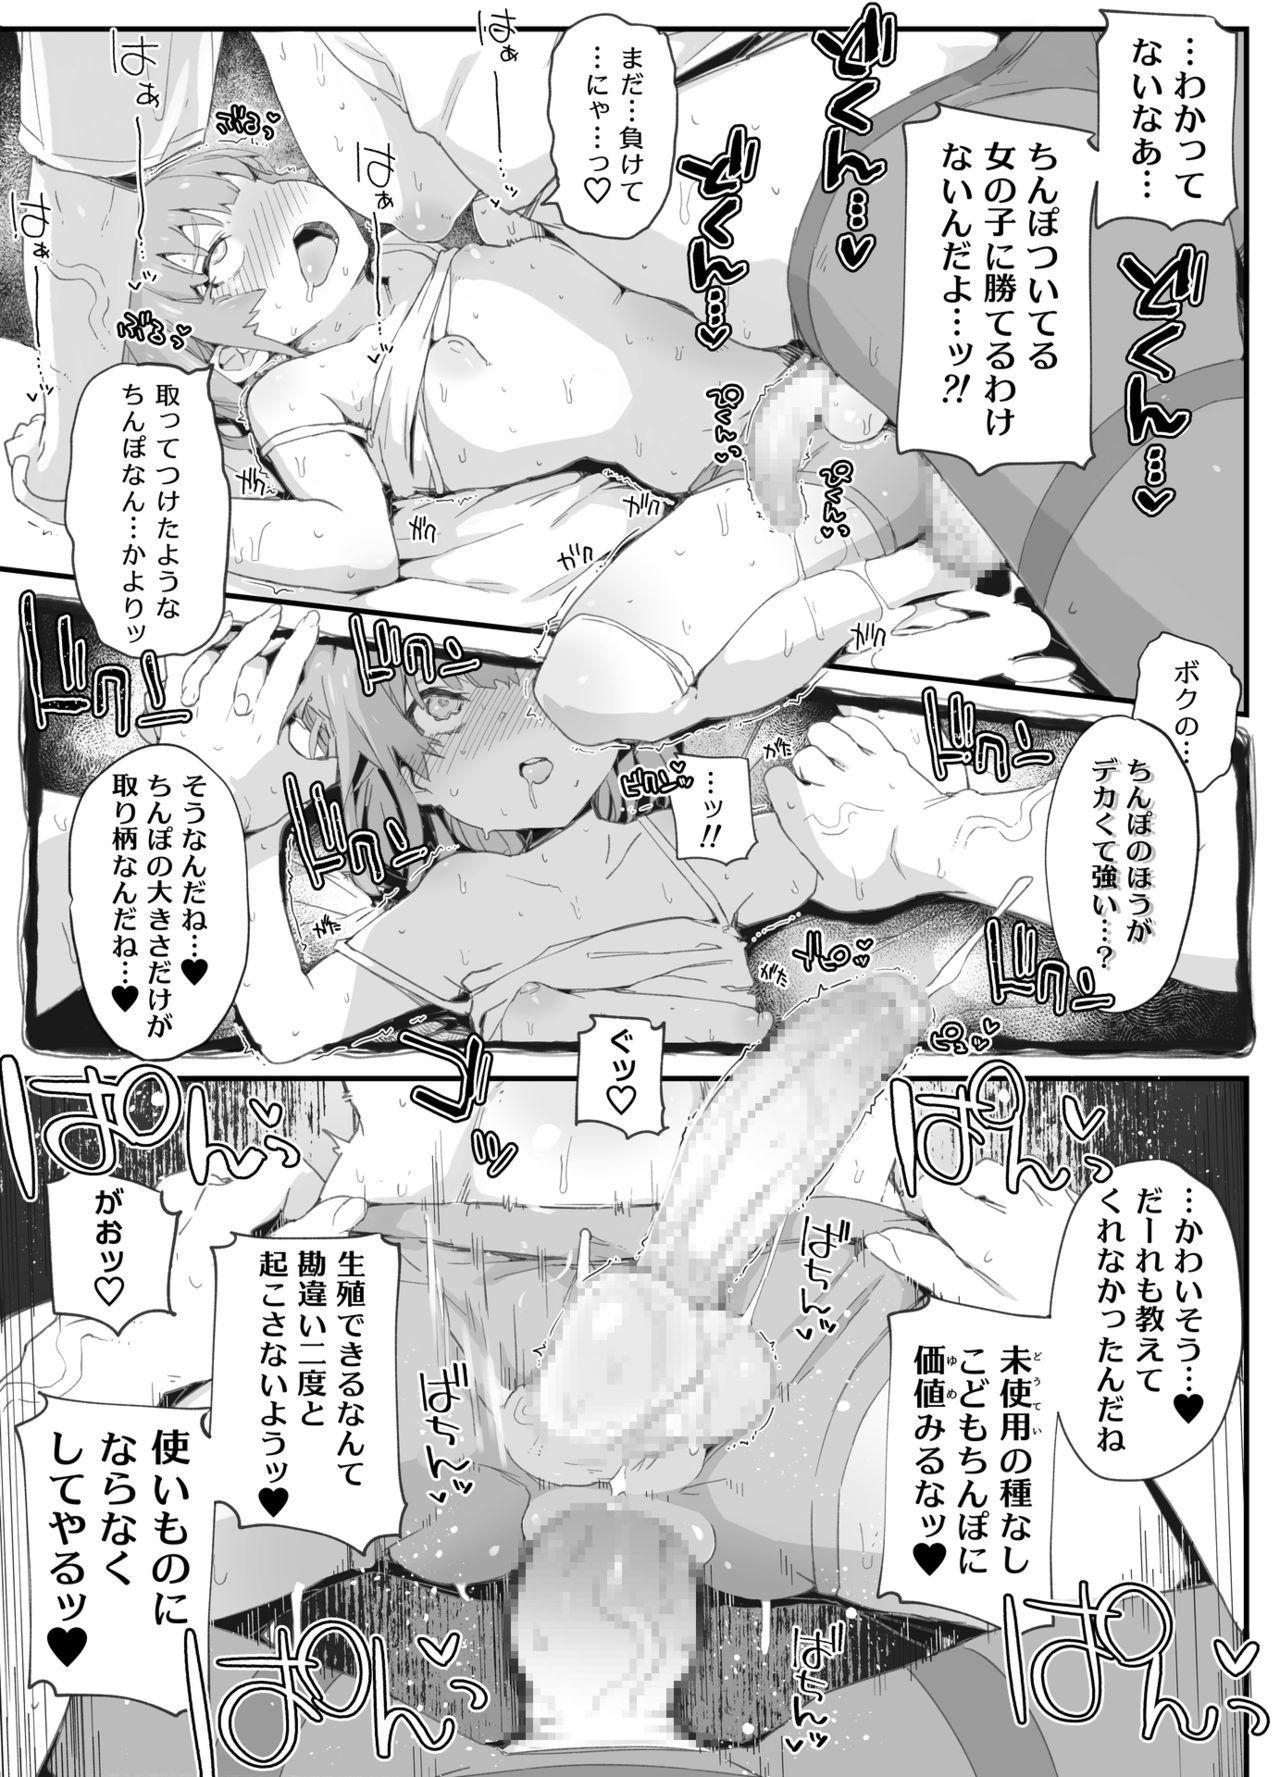 Futanari Onee-san ni Wakarasareta Otokonoko 13